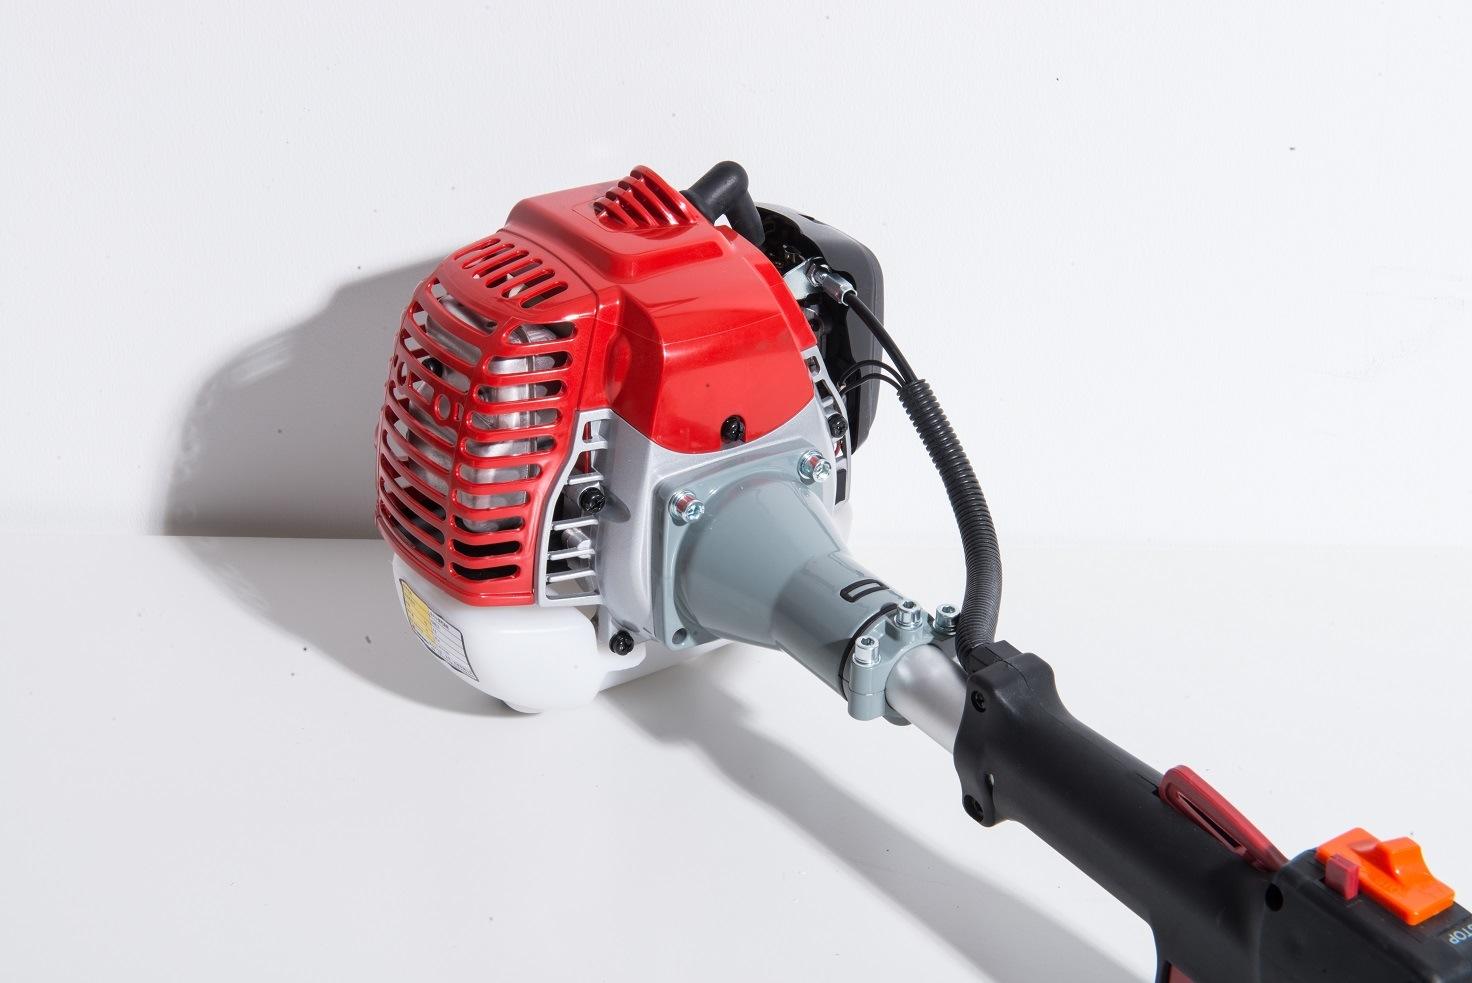 Brush Cutter Powered by Zenoah Gasoline Engine (G26LS)